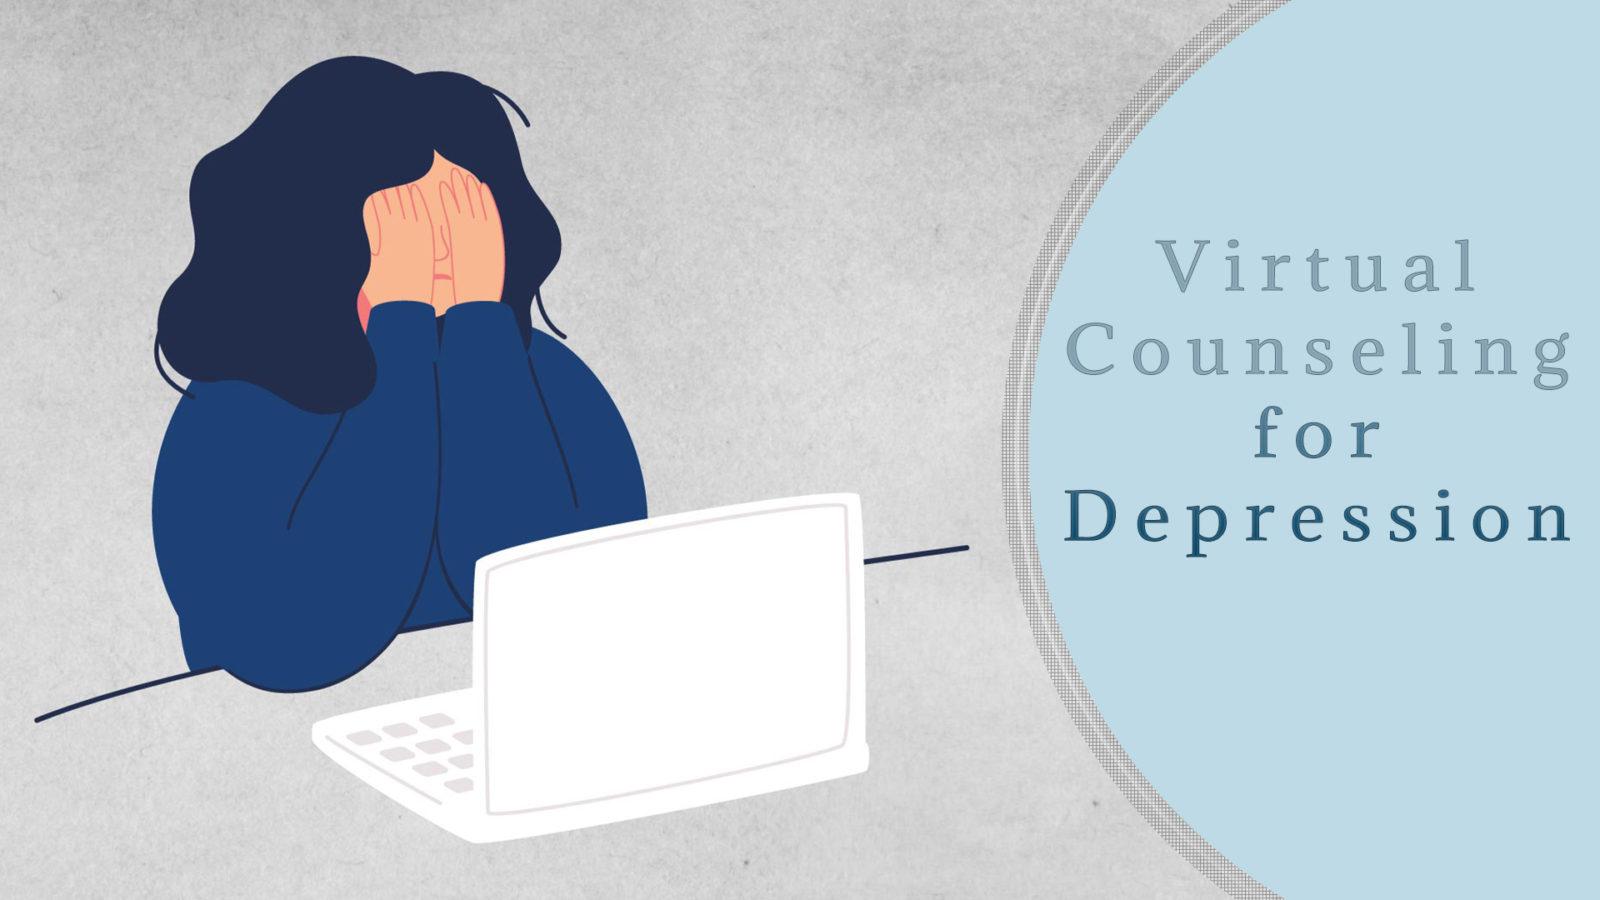 depression counseling virtual